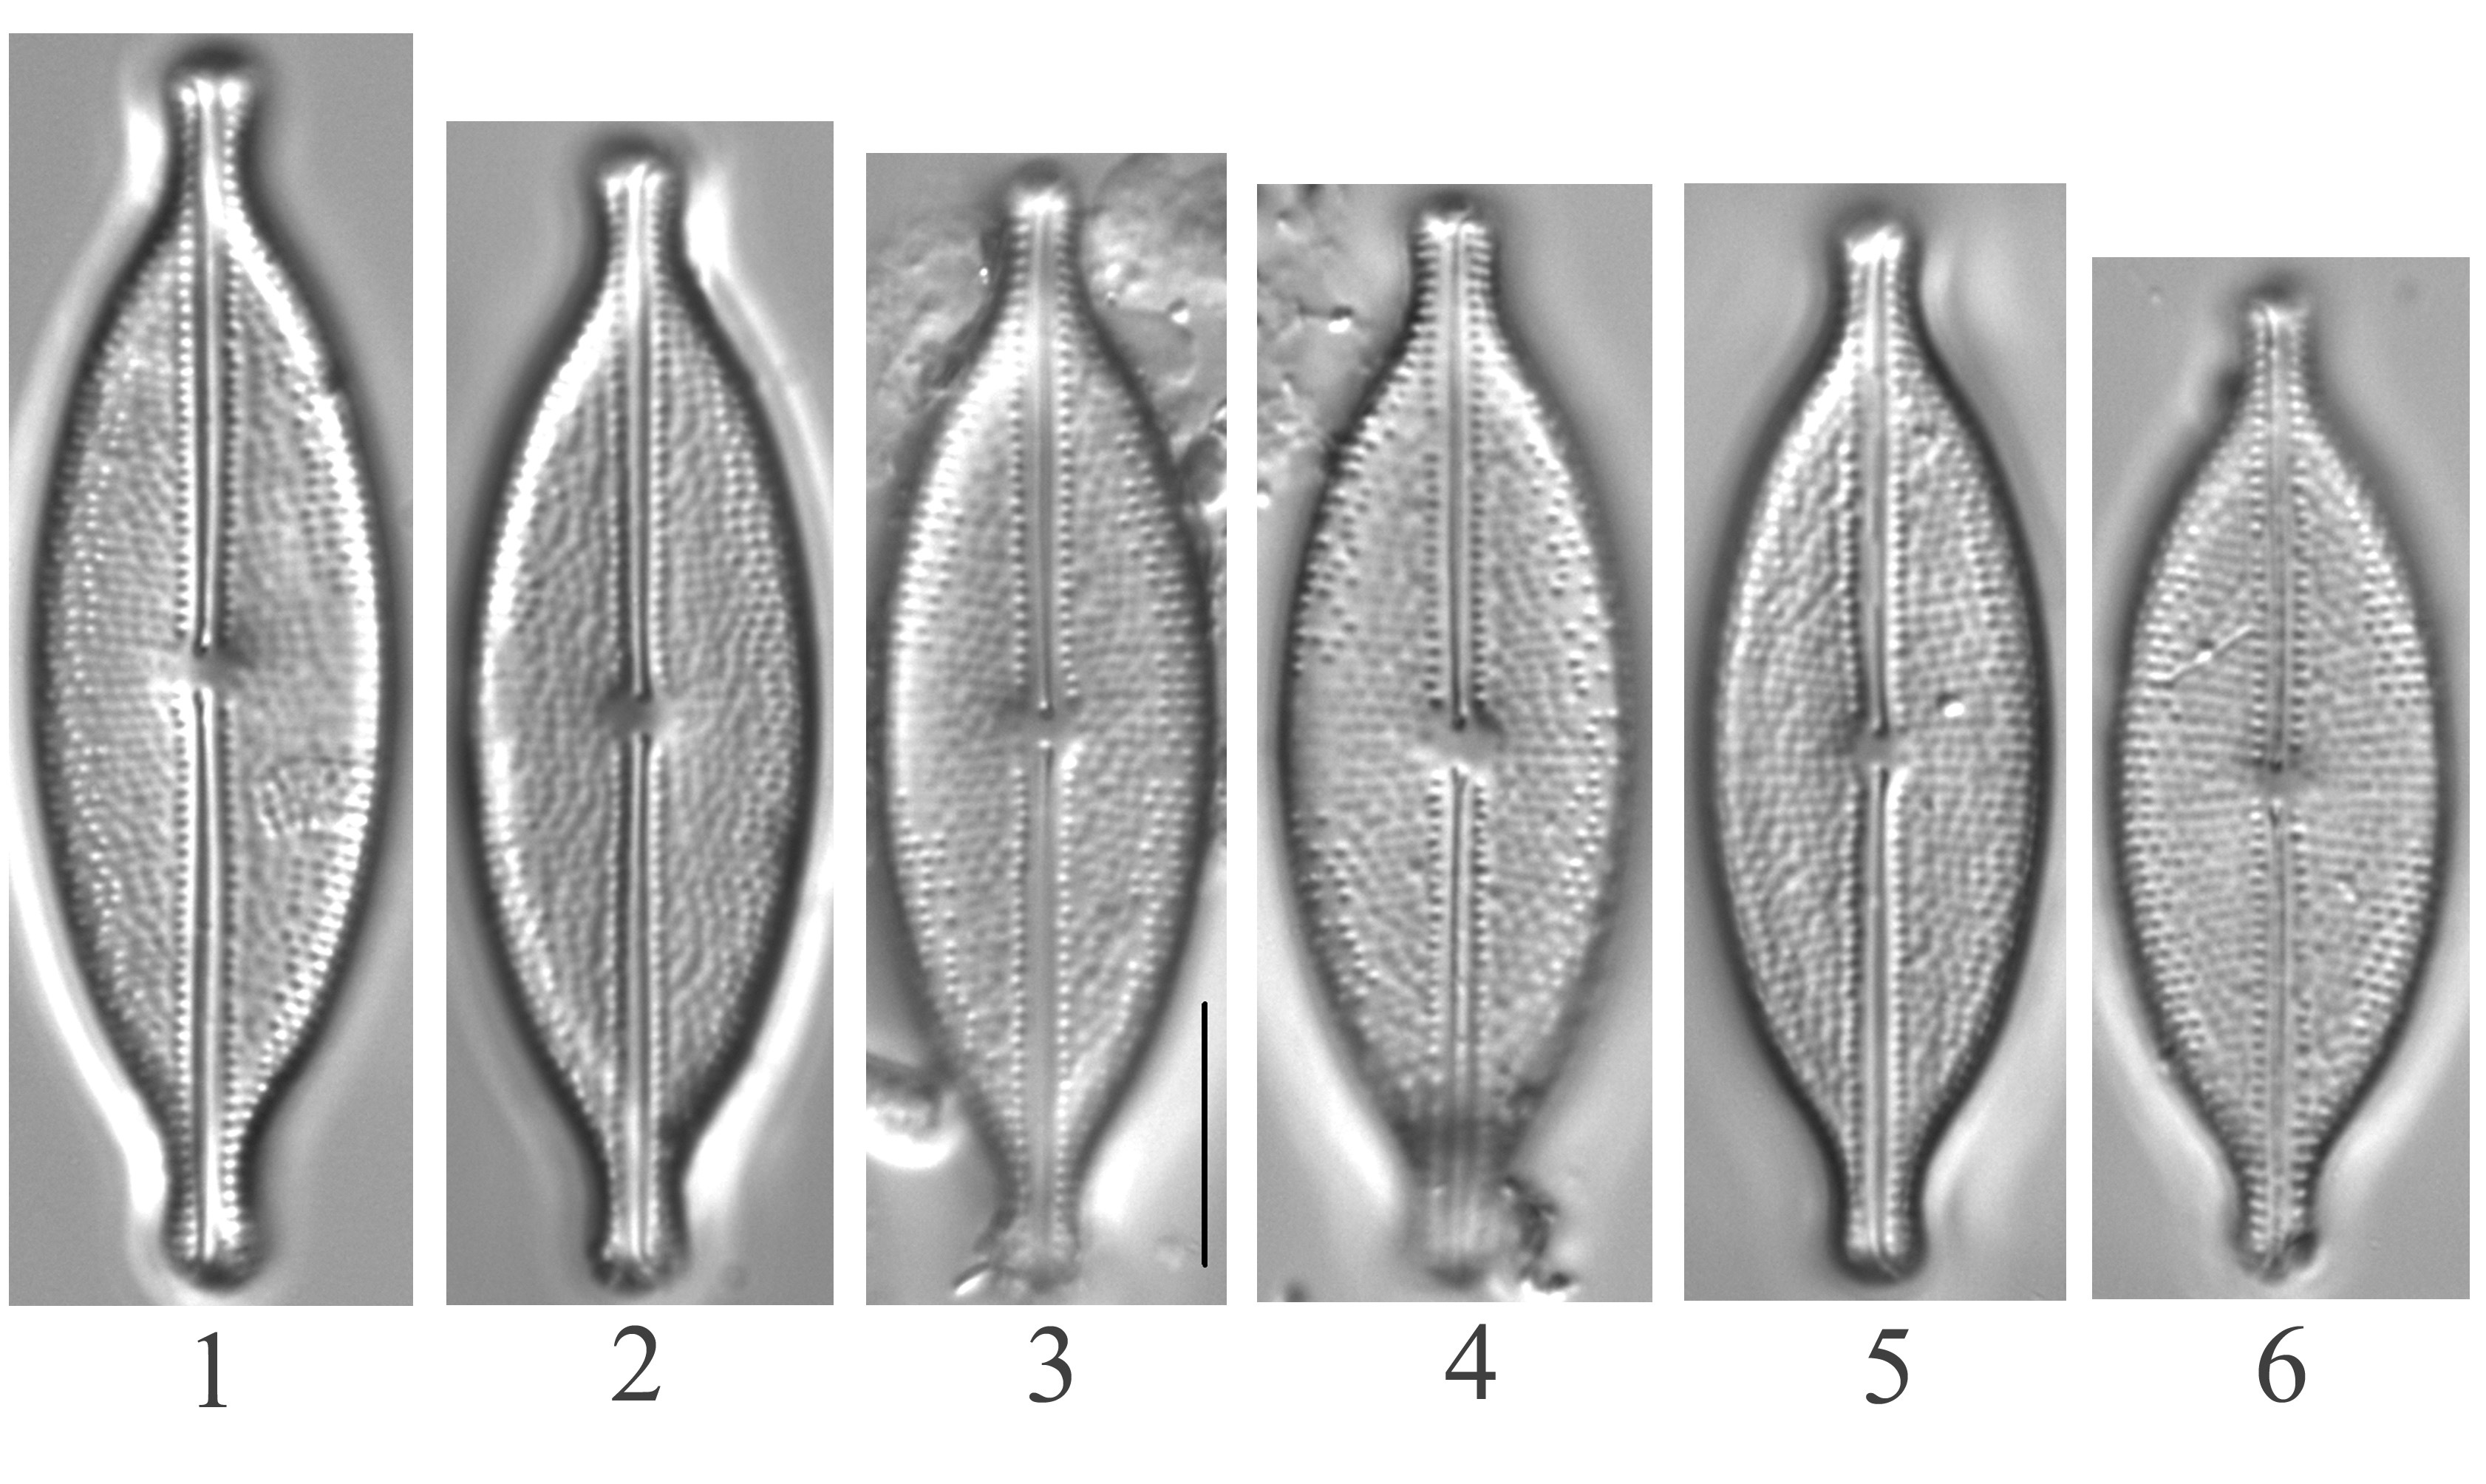 Anomoeoneis Capitata Figs1 6